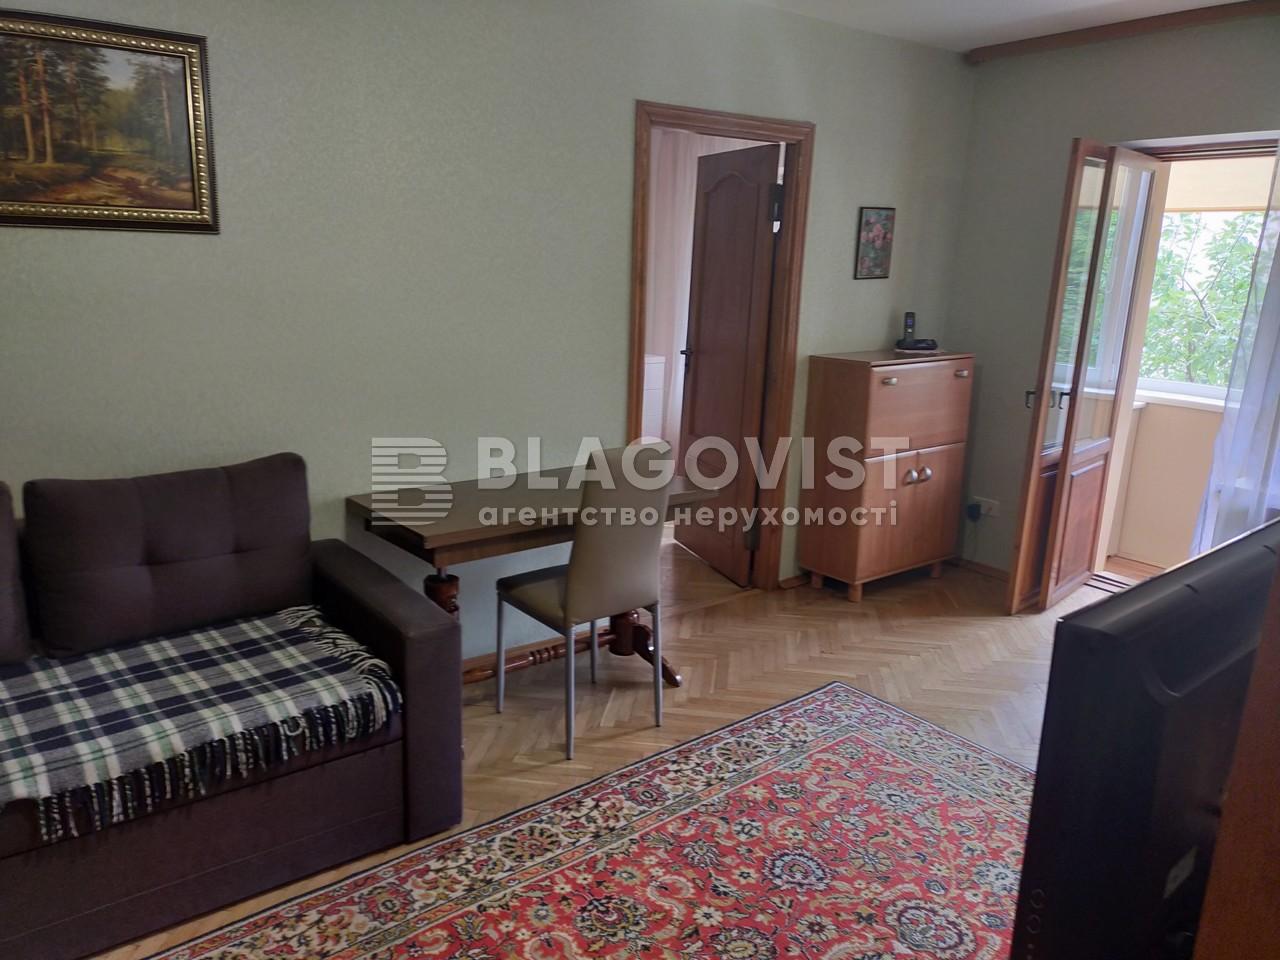 Квартира M-39350, Неманская, 6, Киев - Фото 5